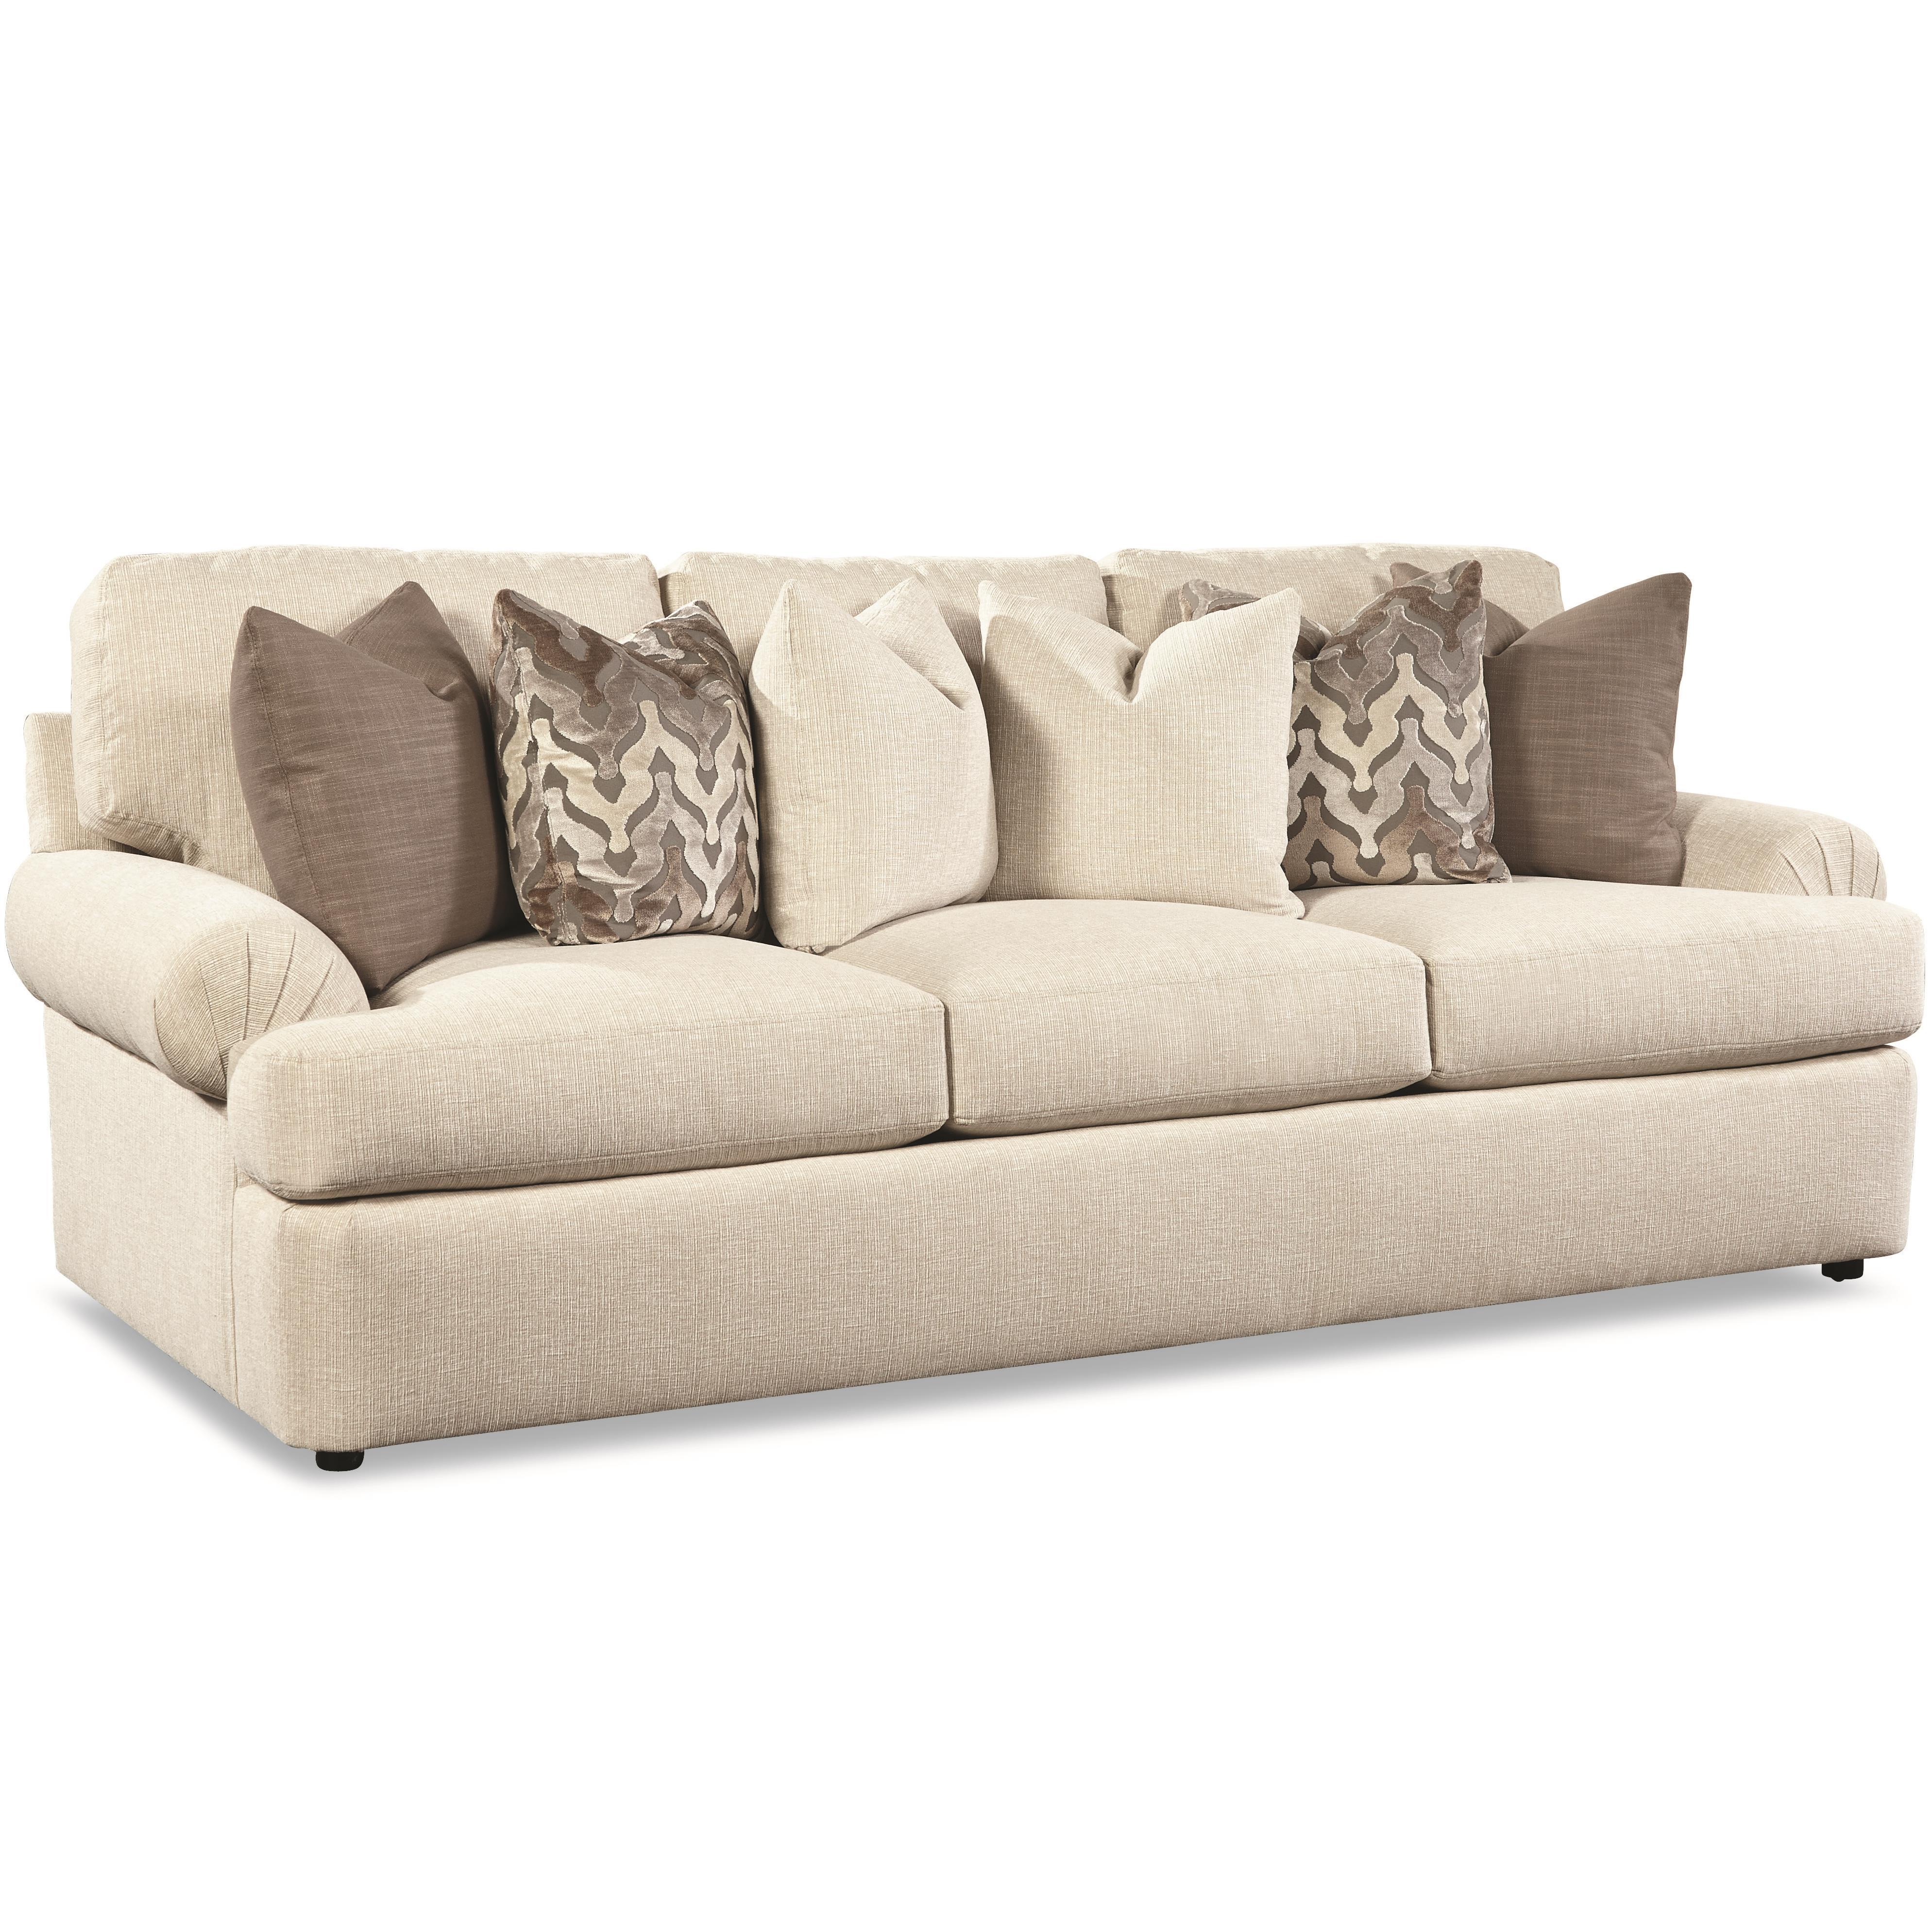 2081 Sofa by Geoffrey Alexander at Sprintz Furniture